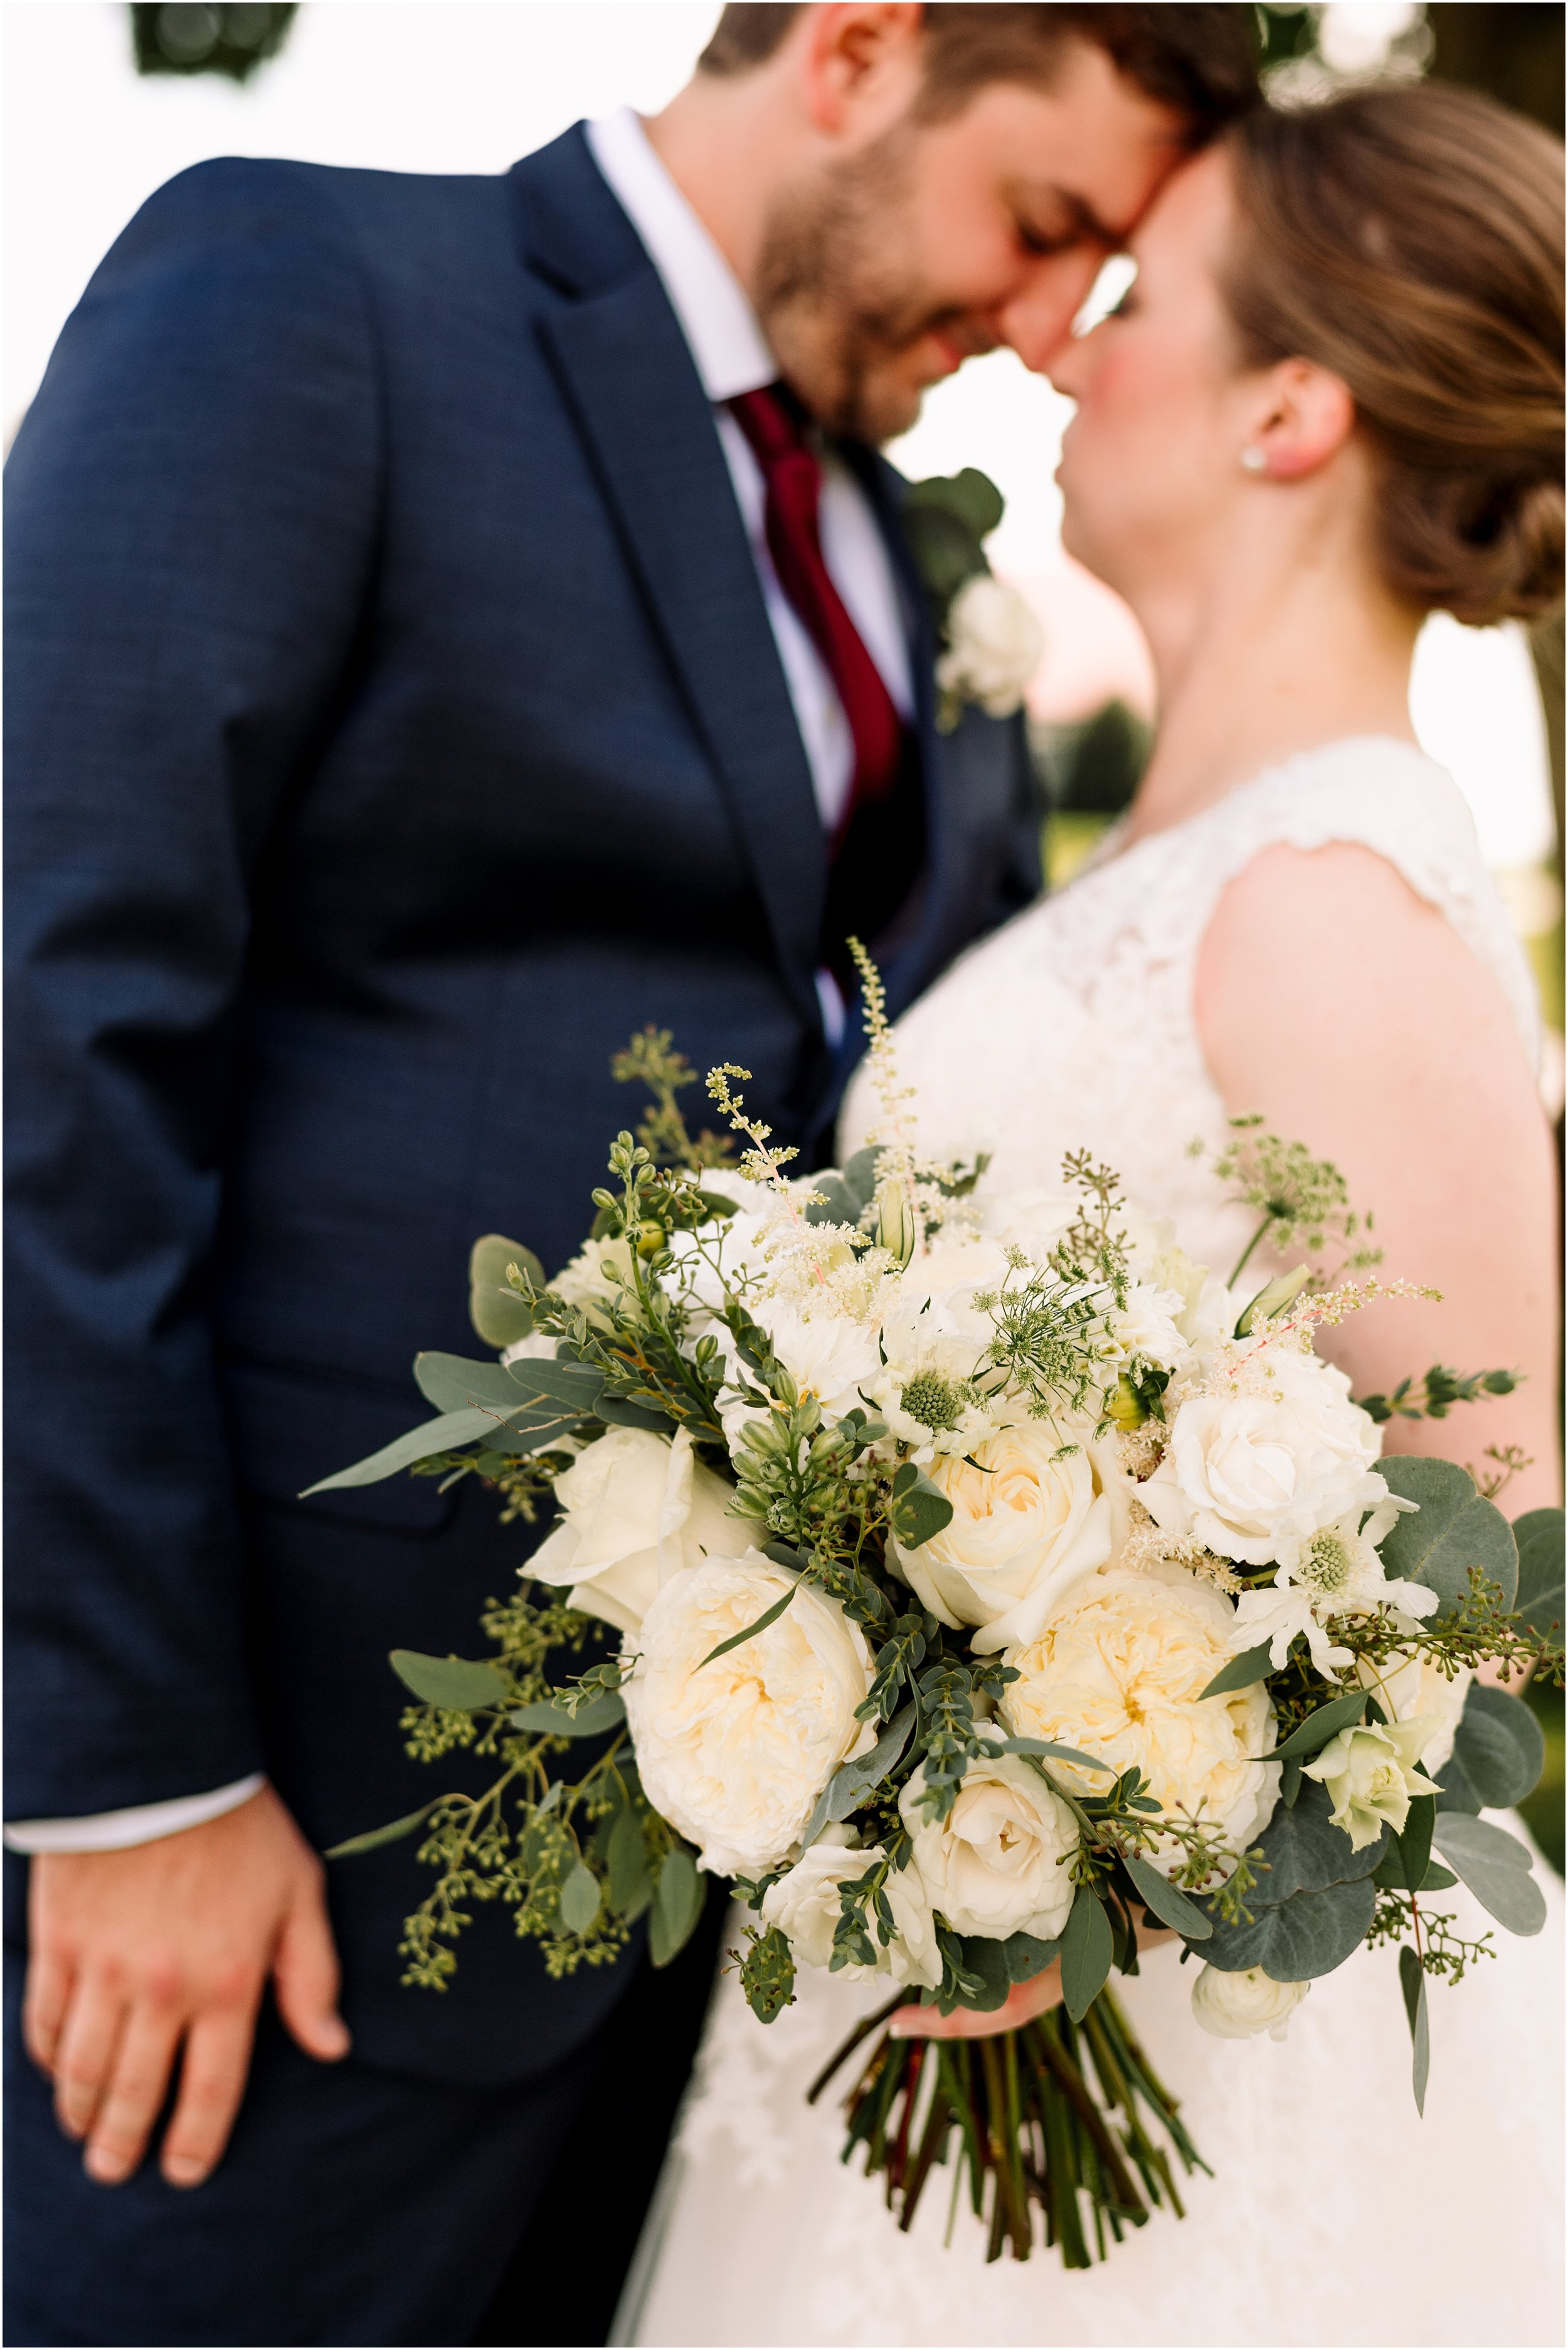 hannah leigh photography Wyndridge Farm Wedding York PA_1489.jpg